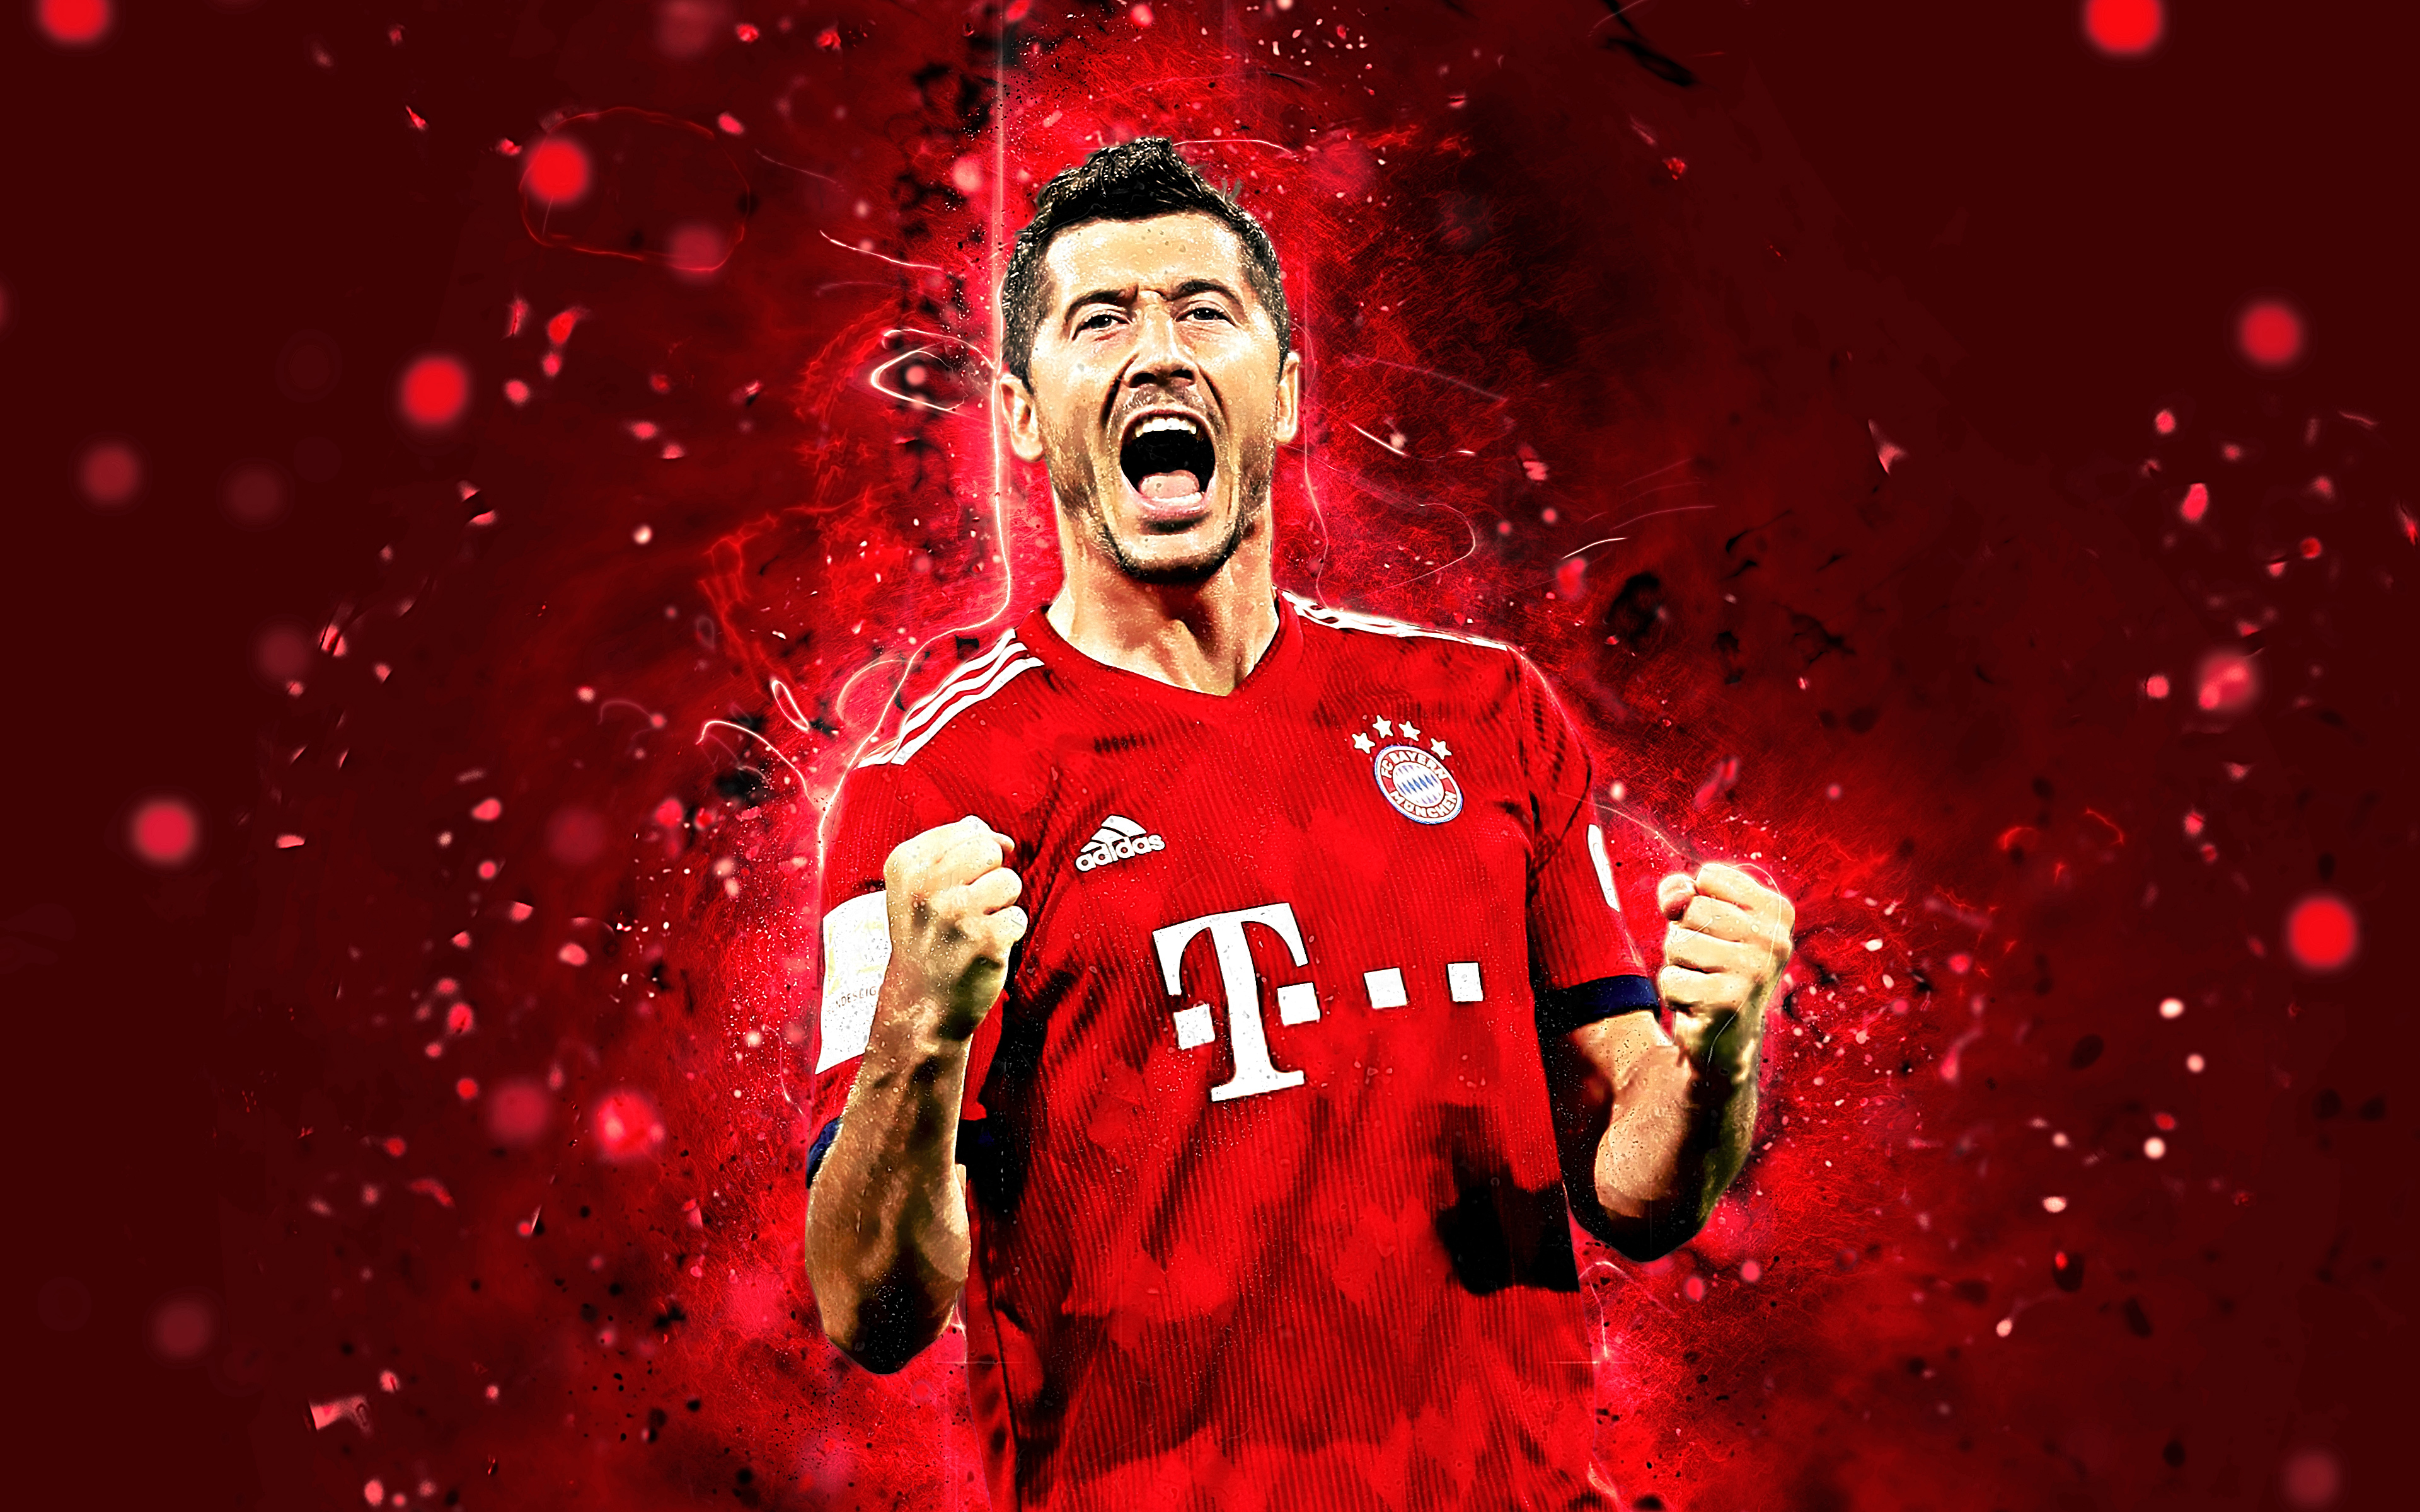 Robert Lewandowski Bayern Robert Lewandowski 4k 209354 Hd Wallpaper Backgrounds Download